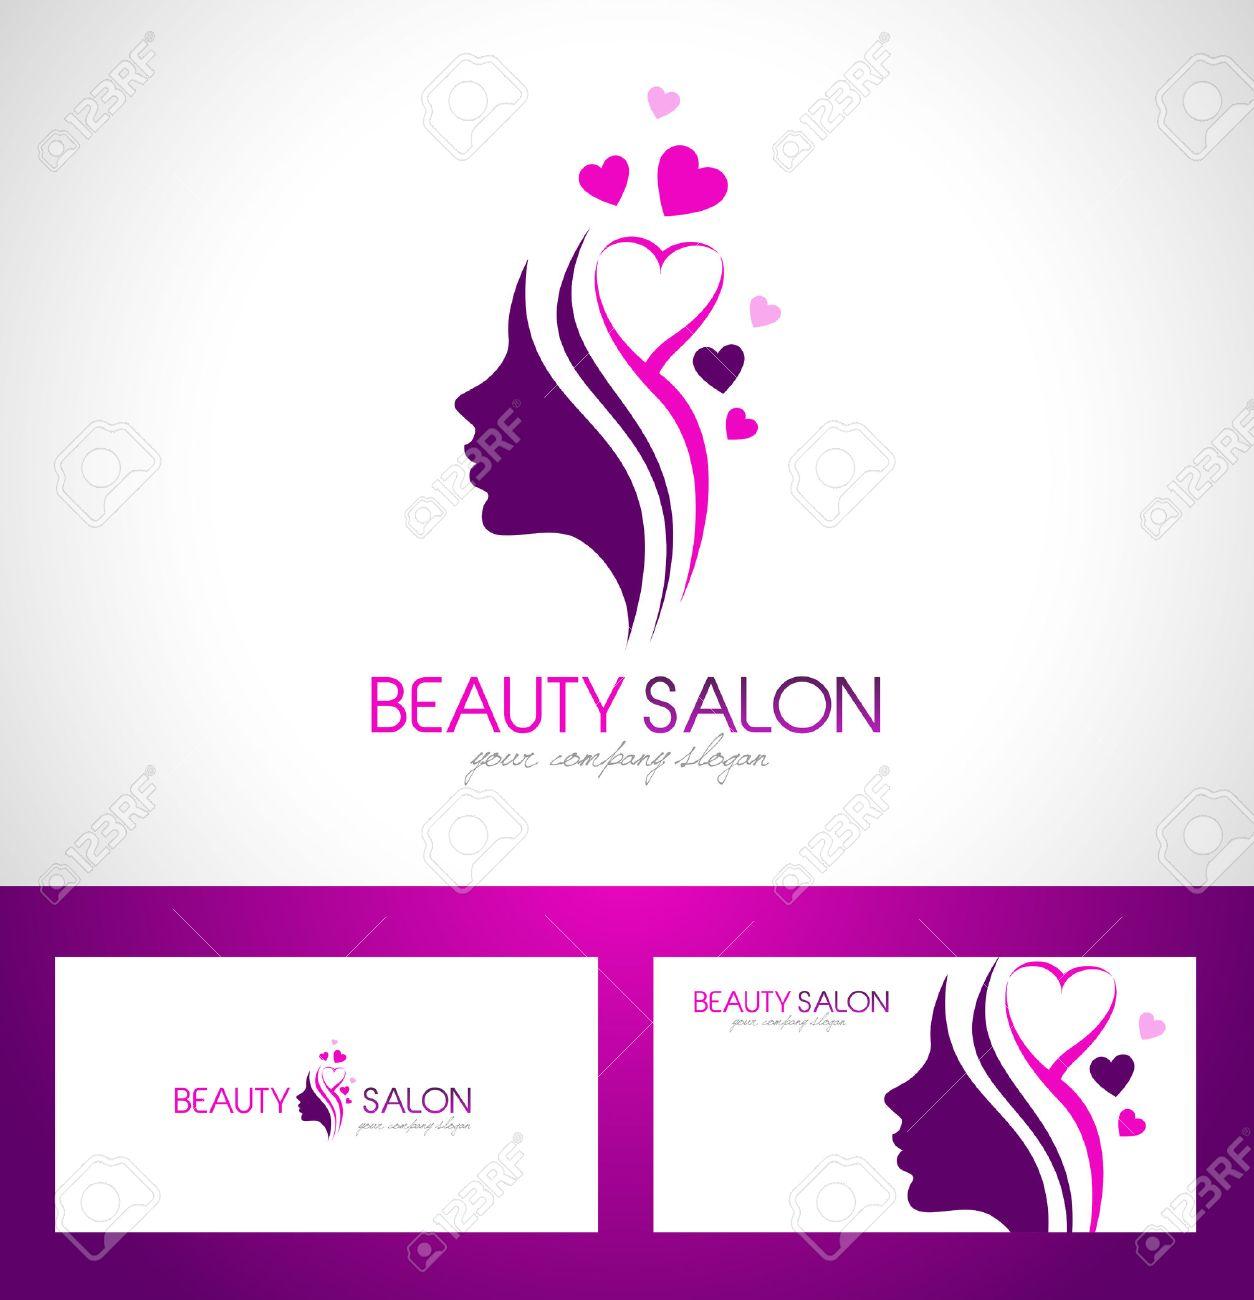 Beauty female face logo designsmetic salon logo design creative beauty female face logo designsmetic salon logo design creative woman face vector altavistaventures Images